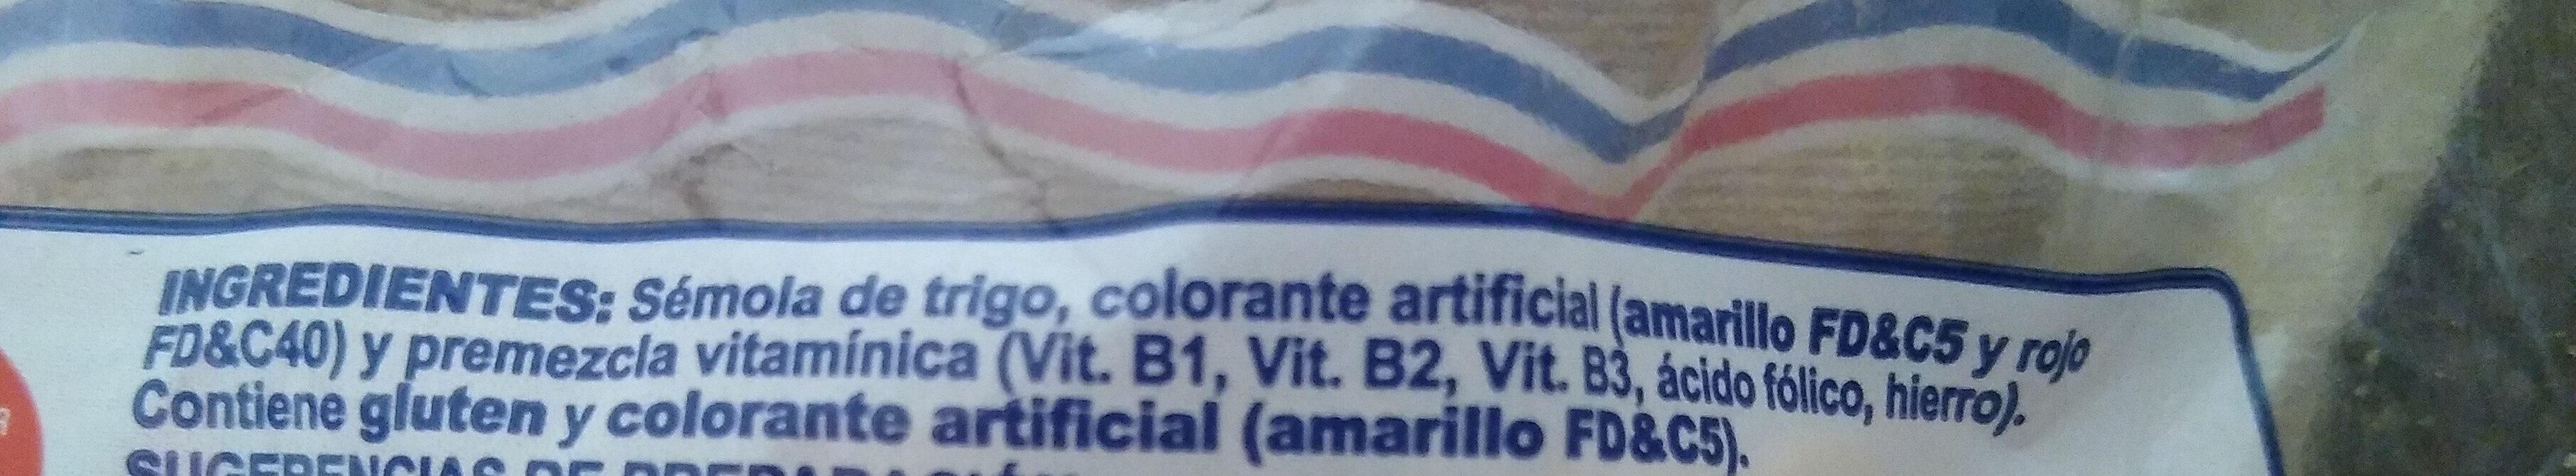 Fideos - Ingredientes - es